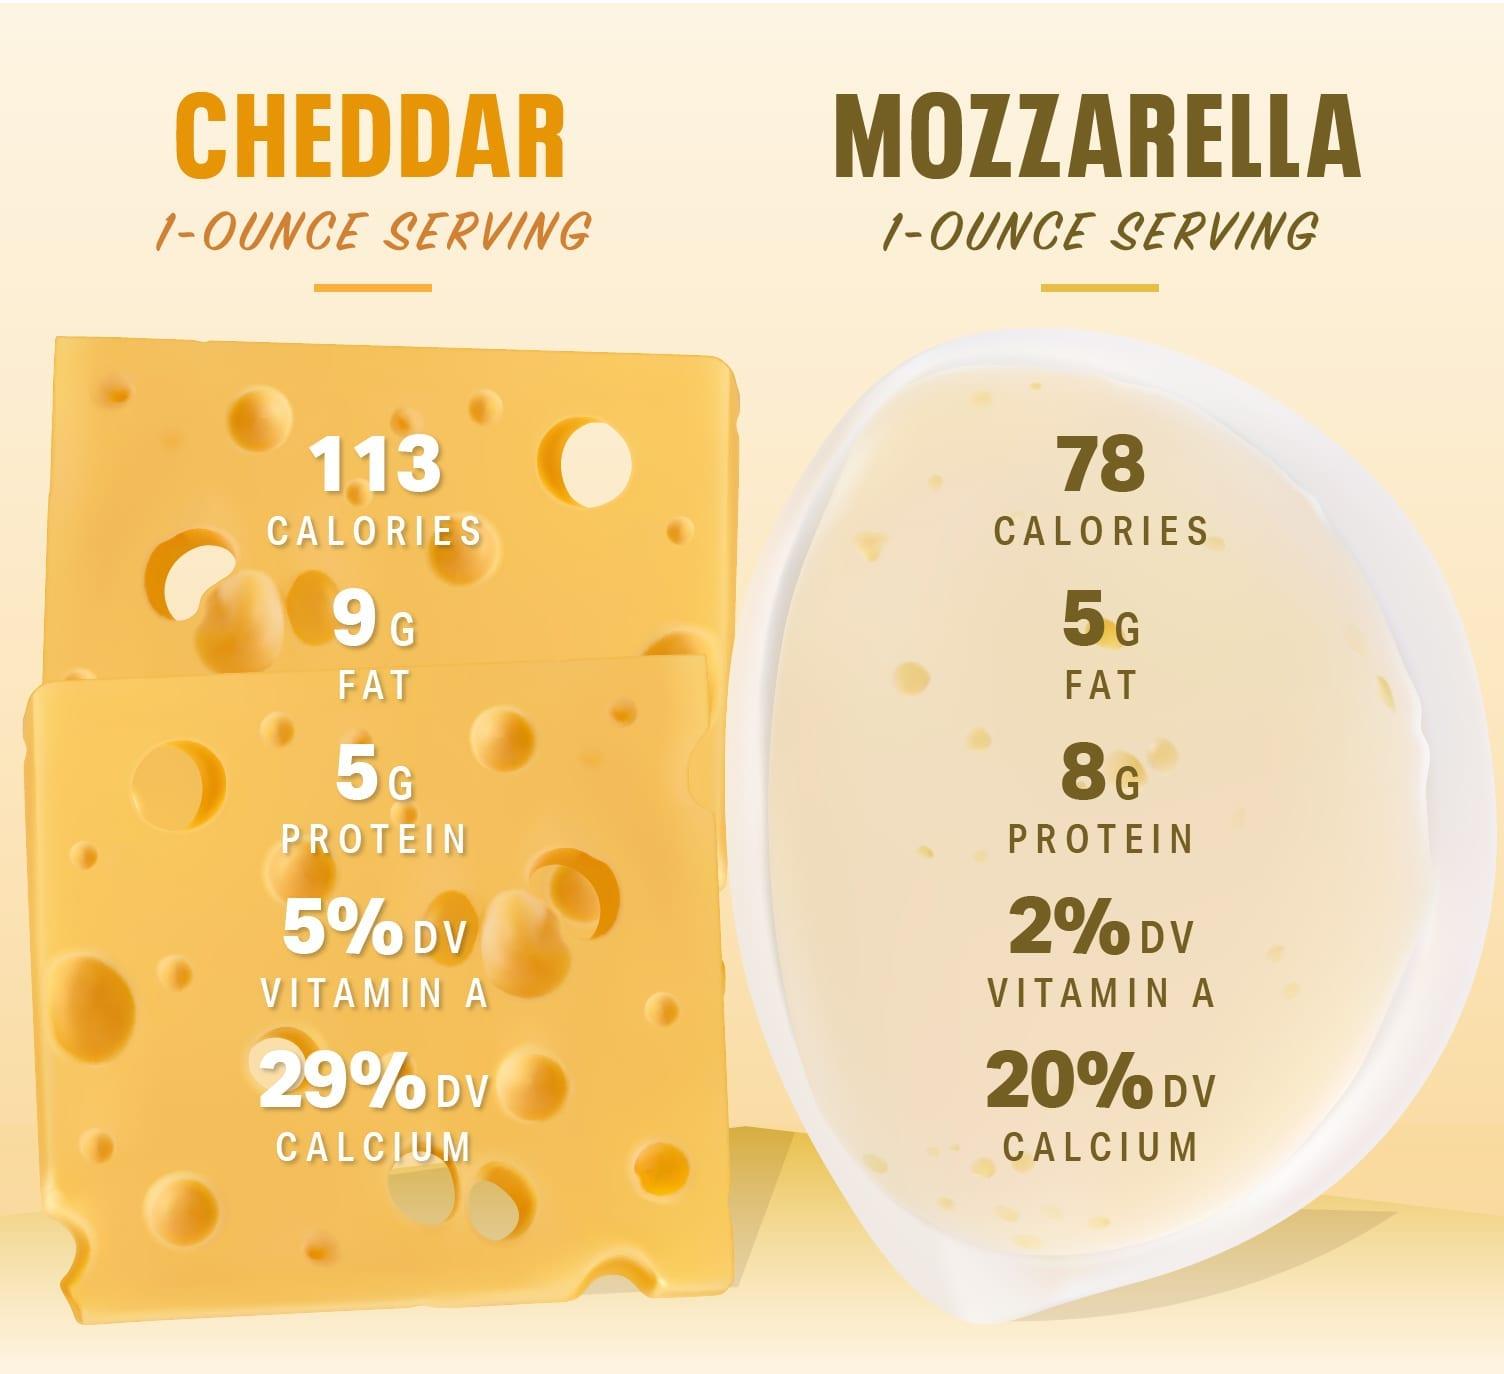 Mozzarella Cheese and Cheddar Cheese